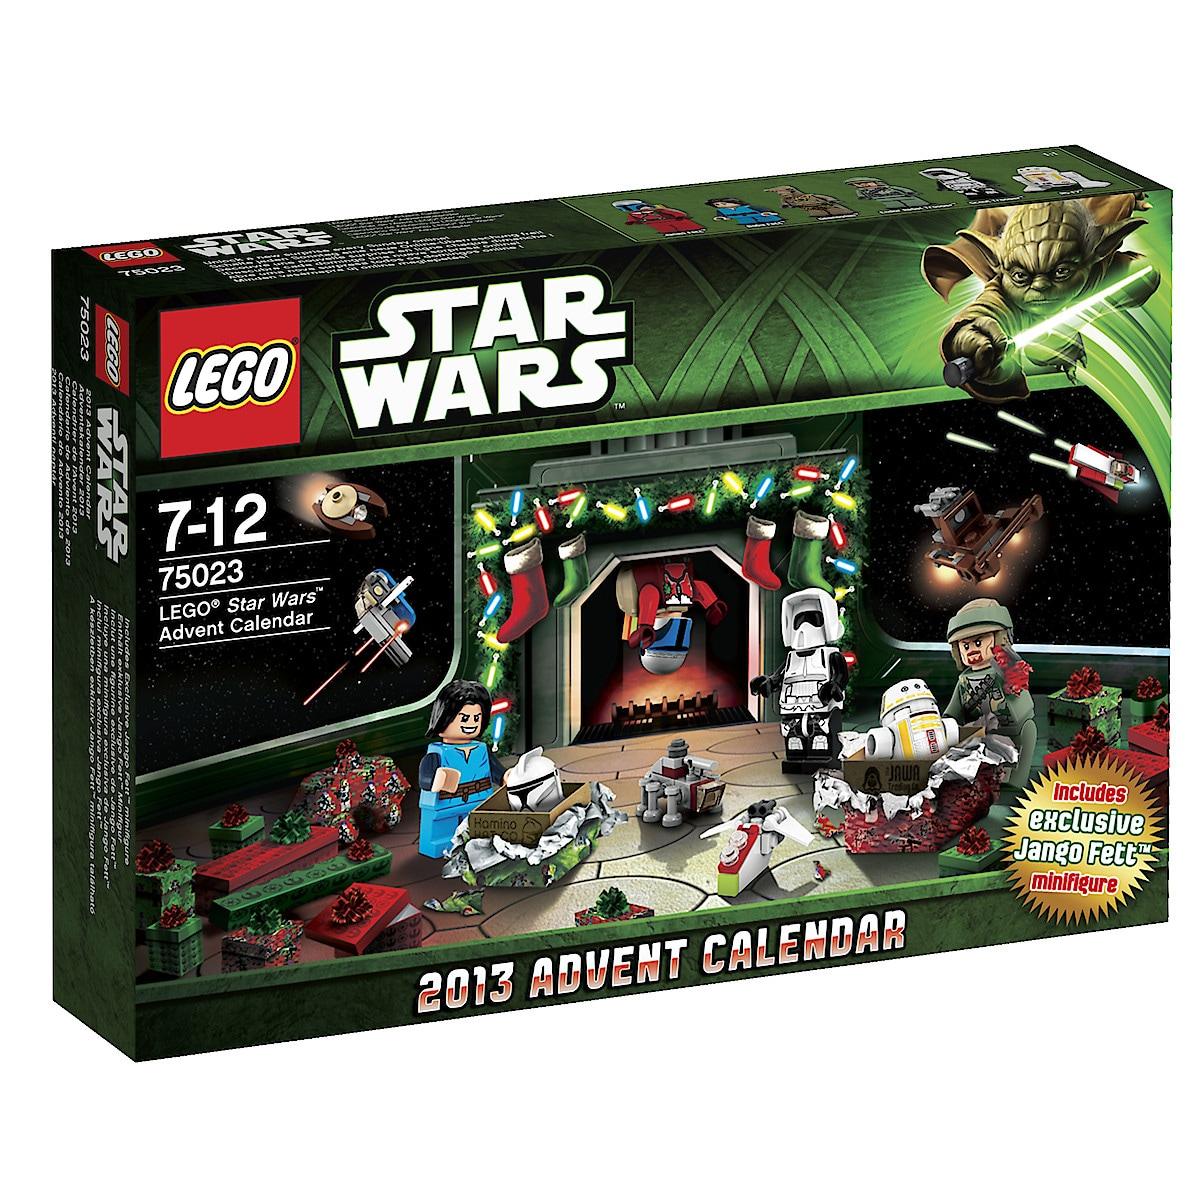 Joulukalenteri Lego Star Wars